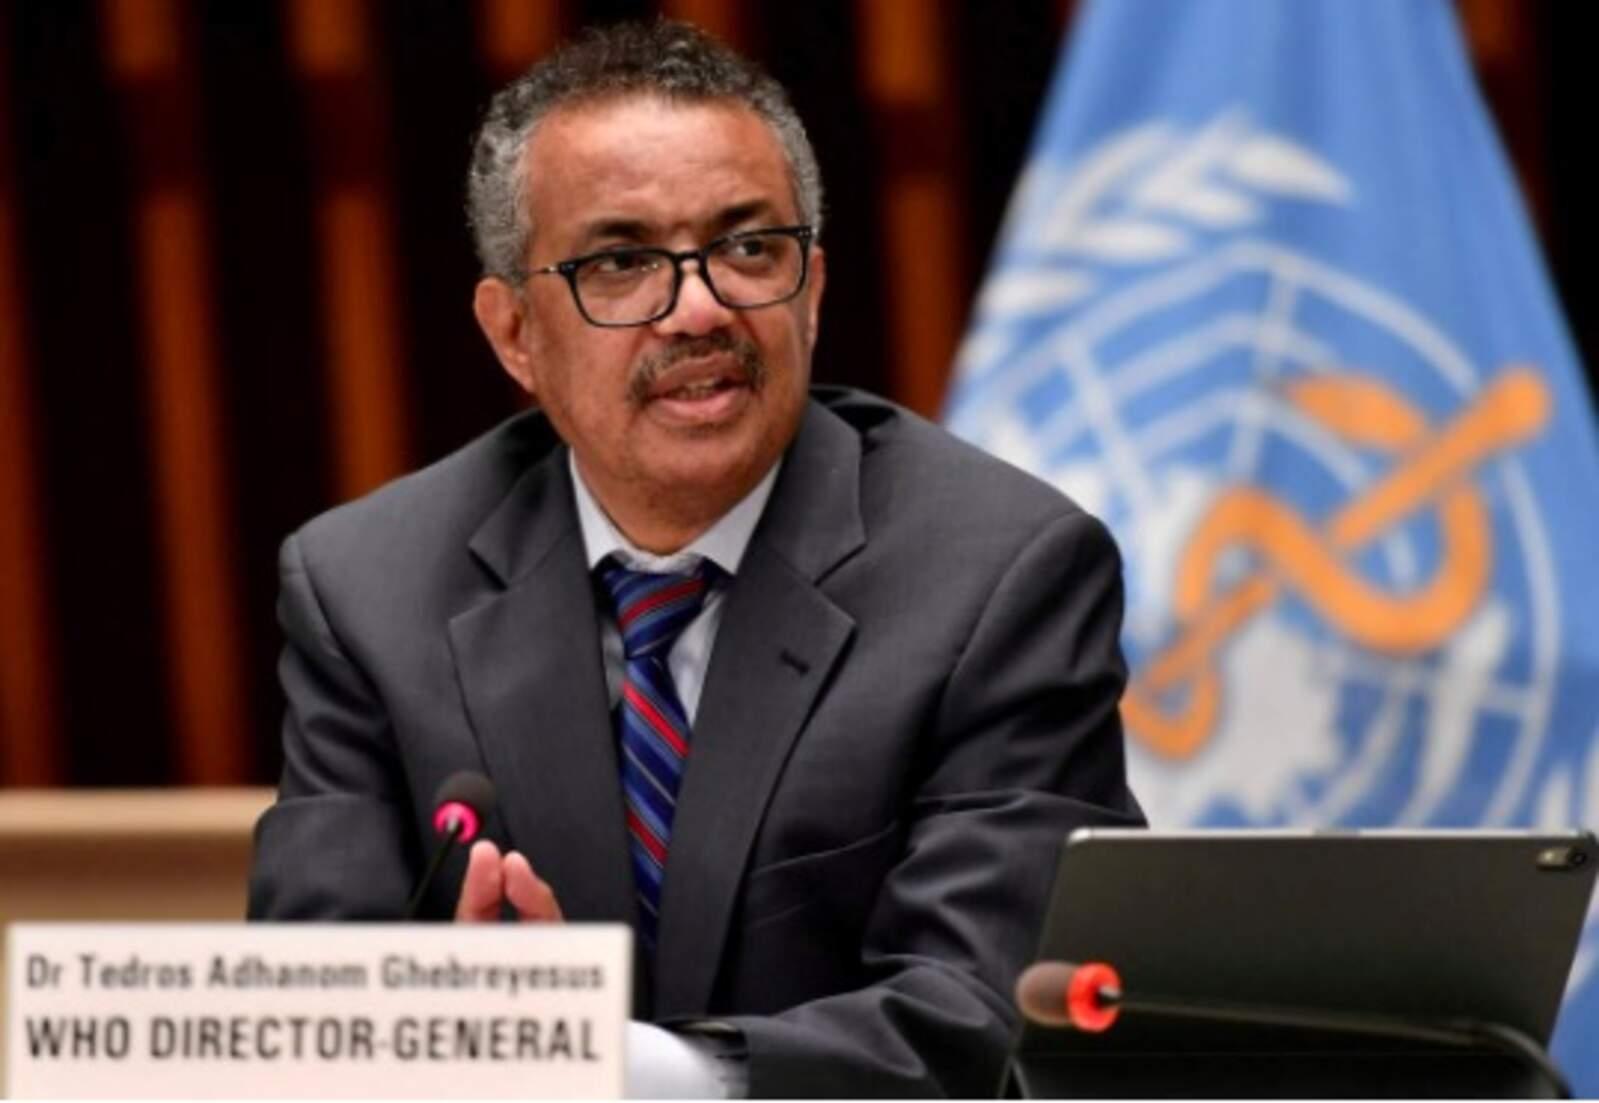 El director general de l'Organització Mundial de la Salut (OMS), Tedros Adhanom Ghebreyesus